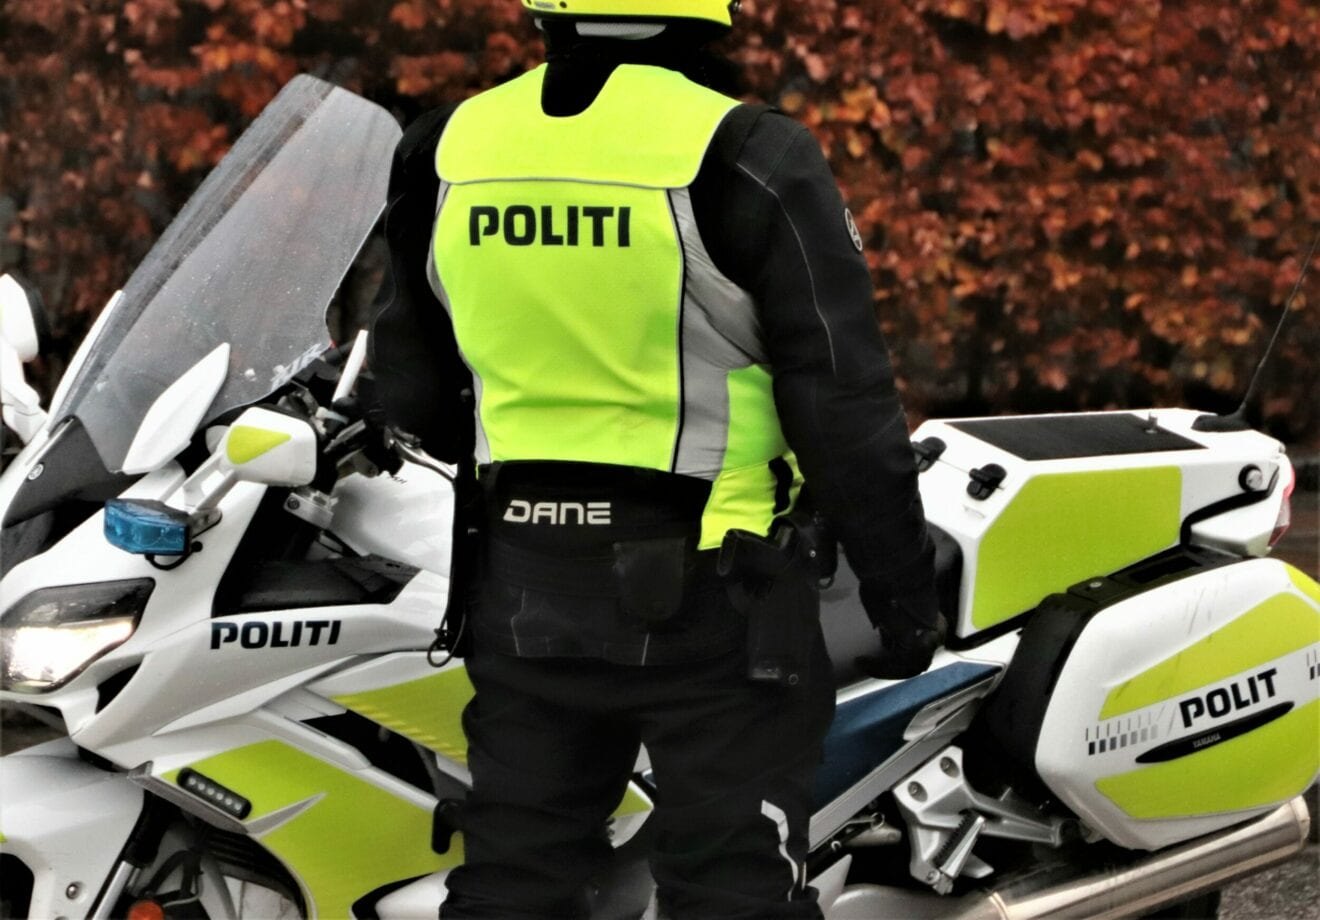 Politirapporten for Gentofte Kommune i tidsrummet 2021-07-02 til 2021-07-13